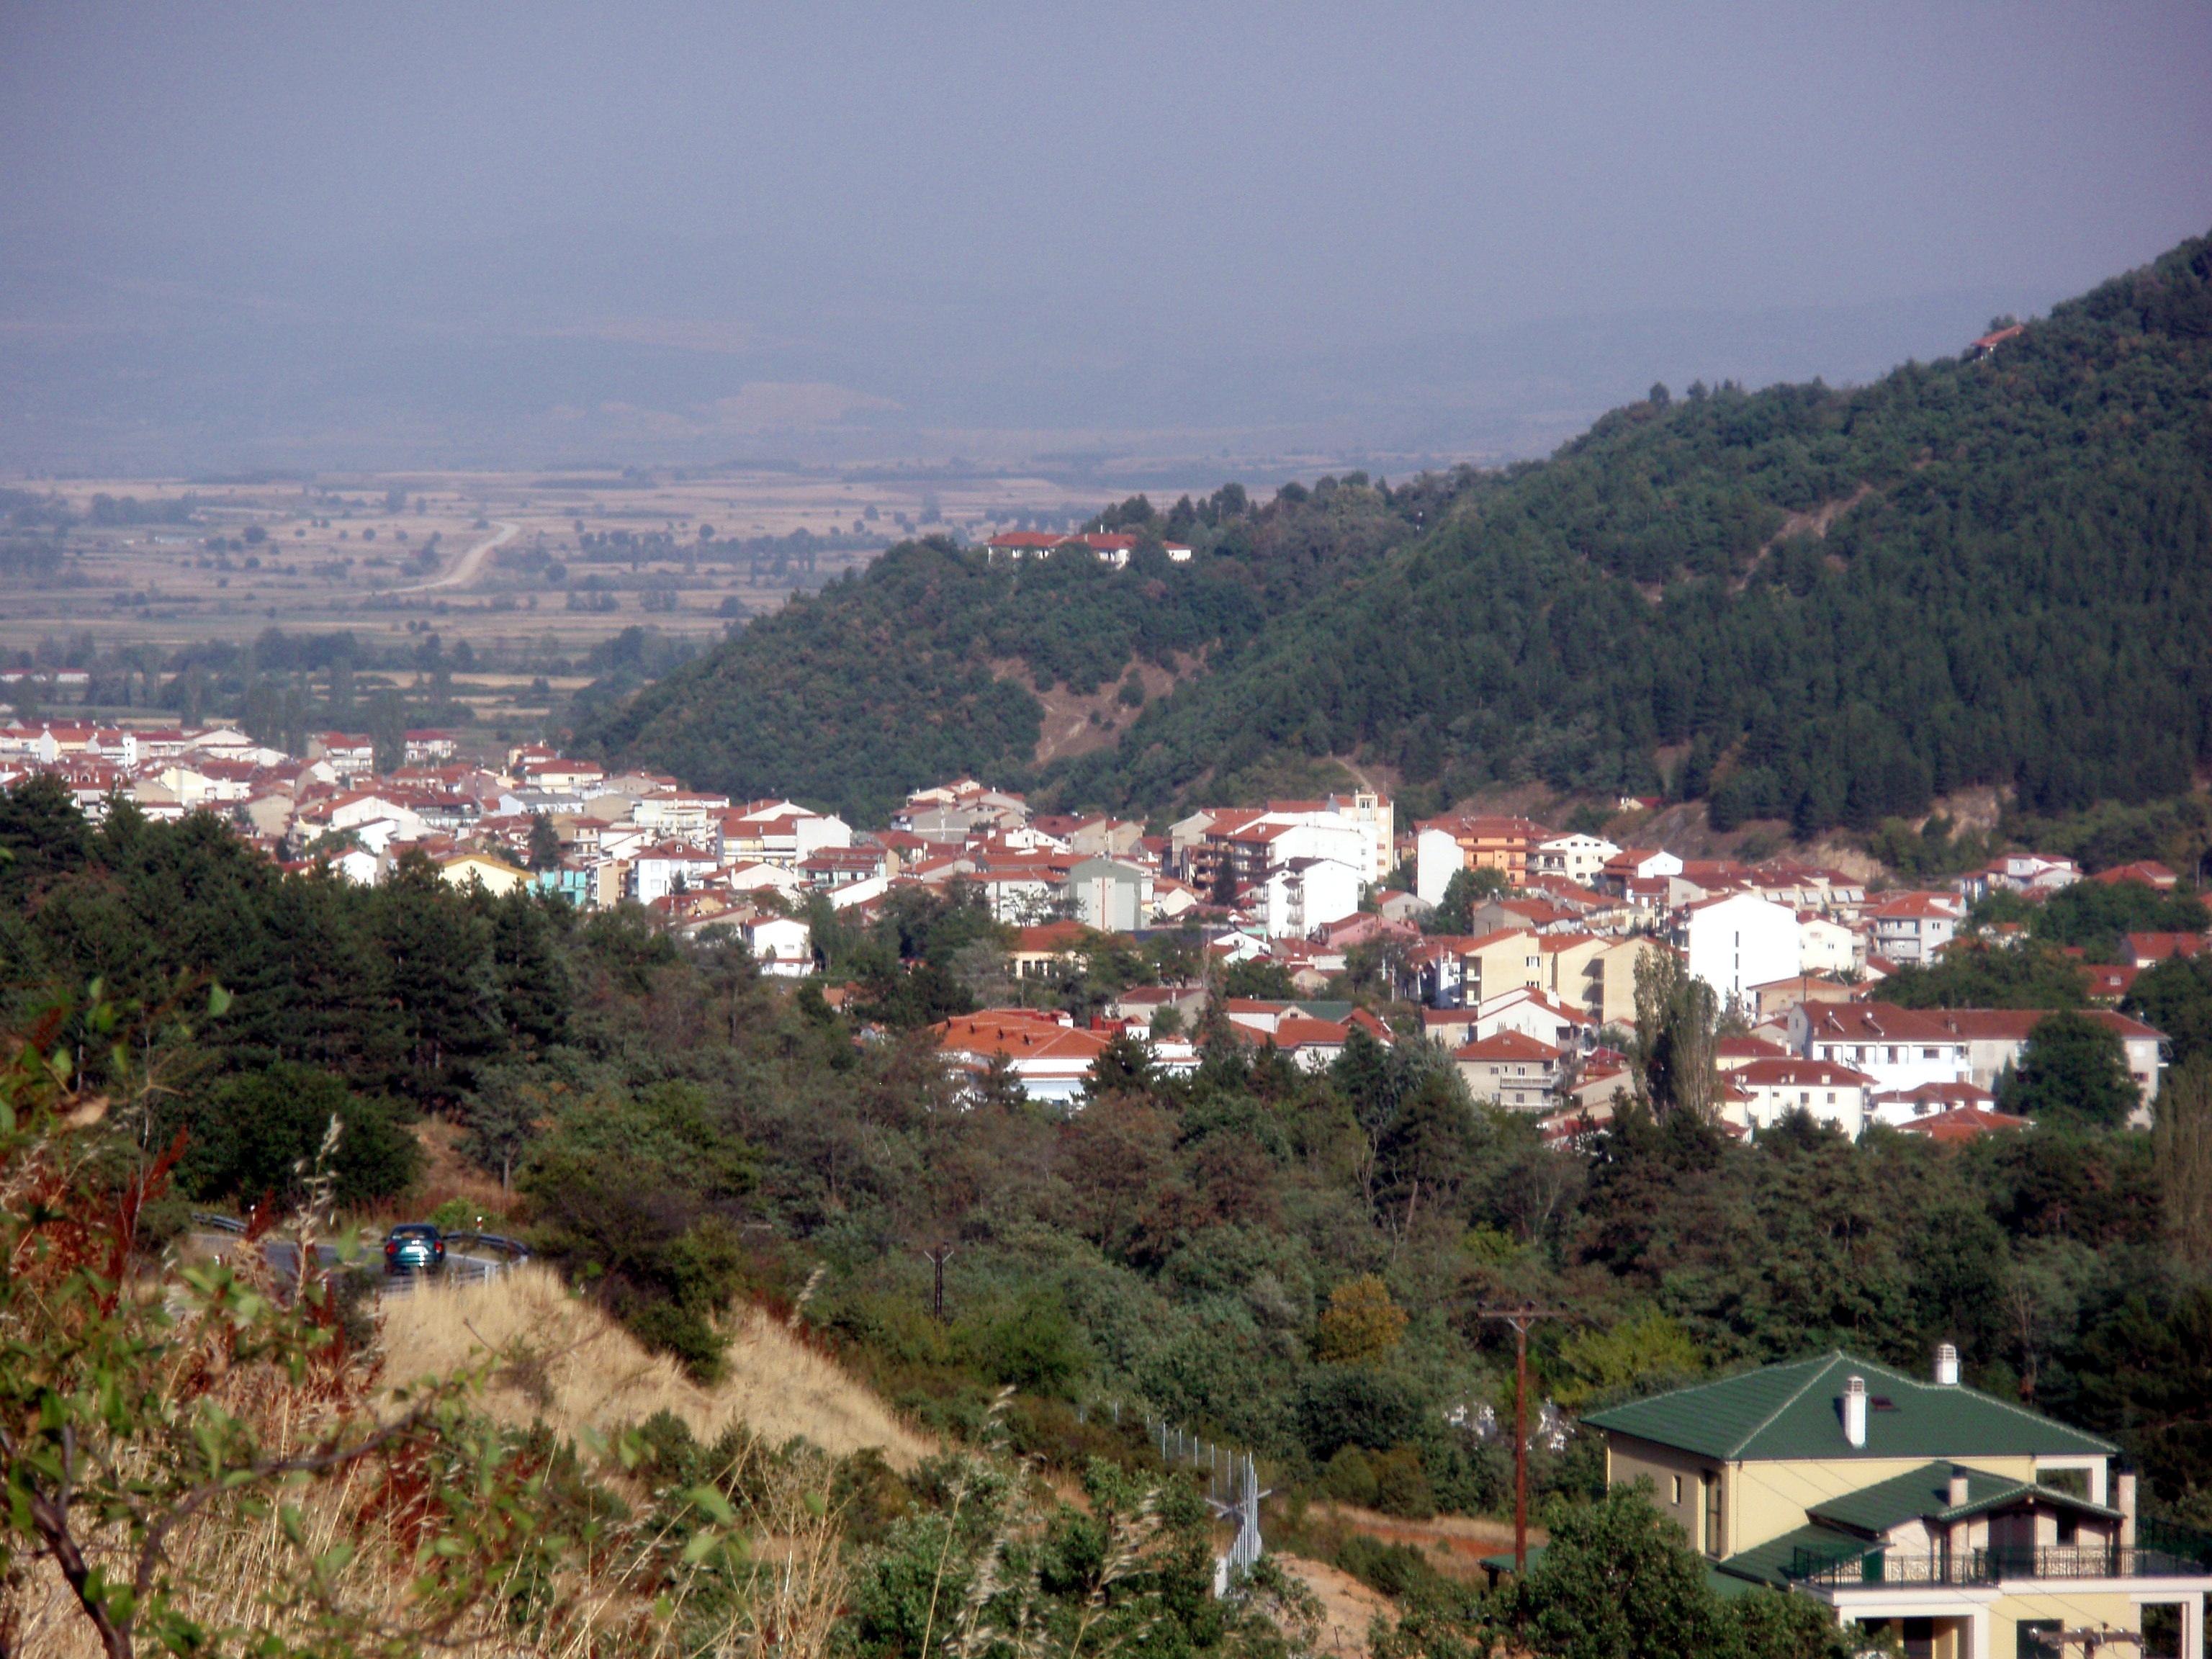 File:Florina (city), Florinanorthwest city